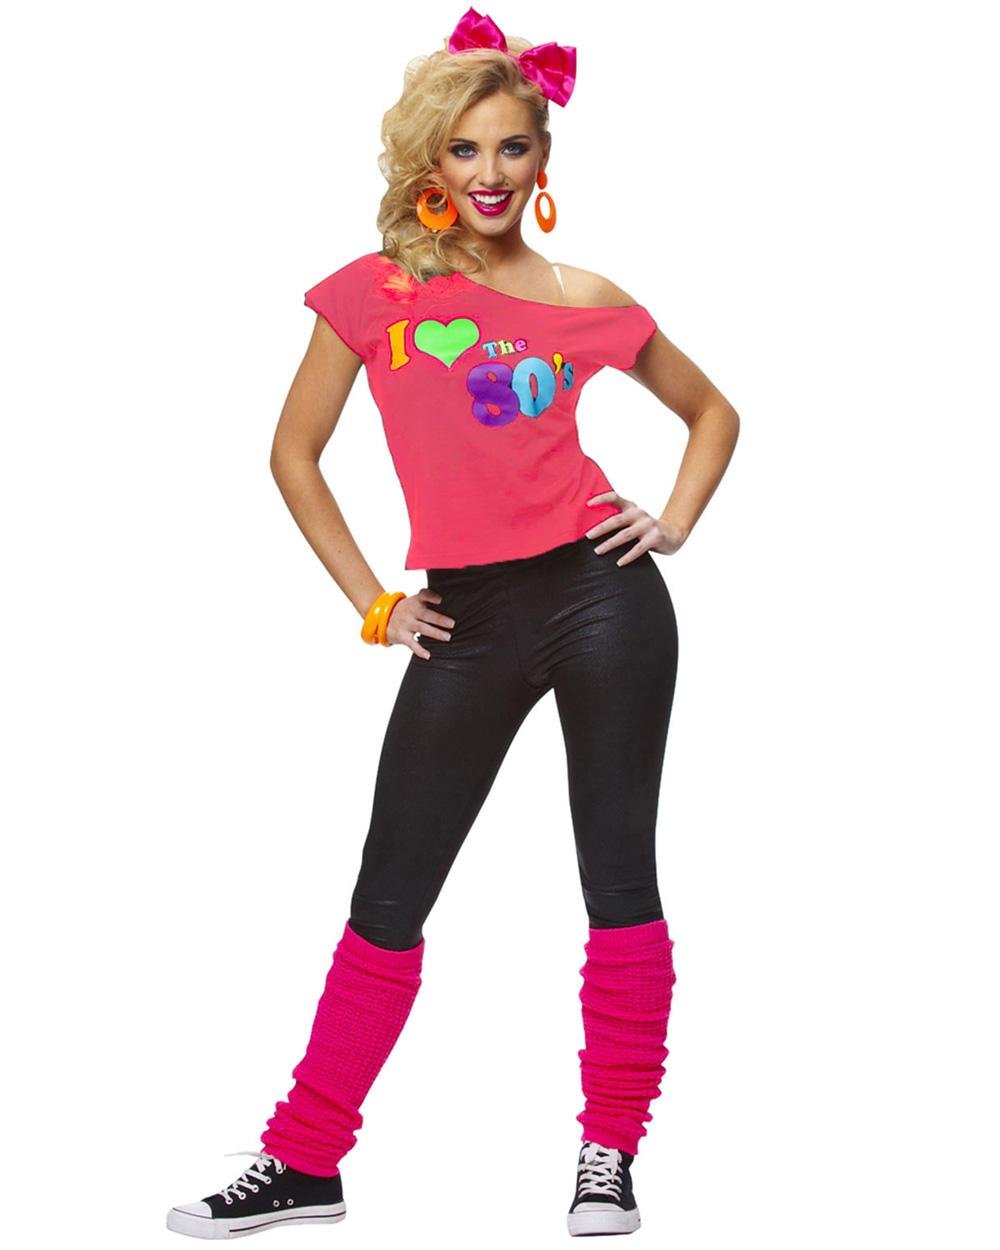 K73 I Love The 80's T-shirt Costume Ladies 1980s 80s Fancy